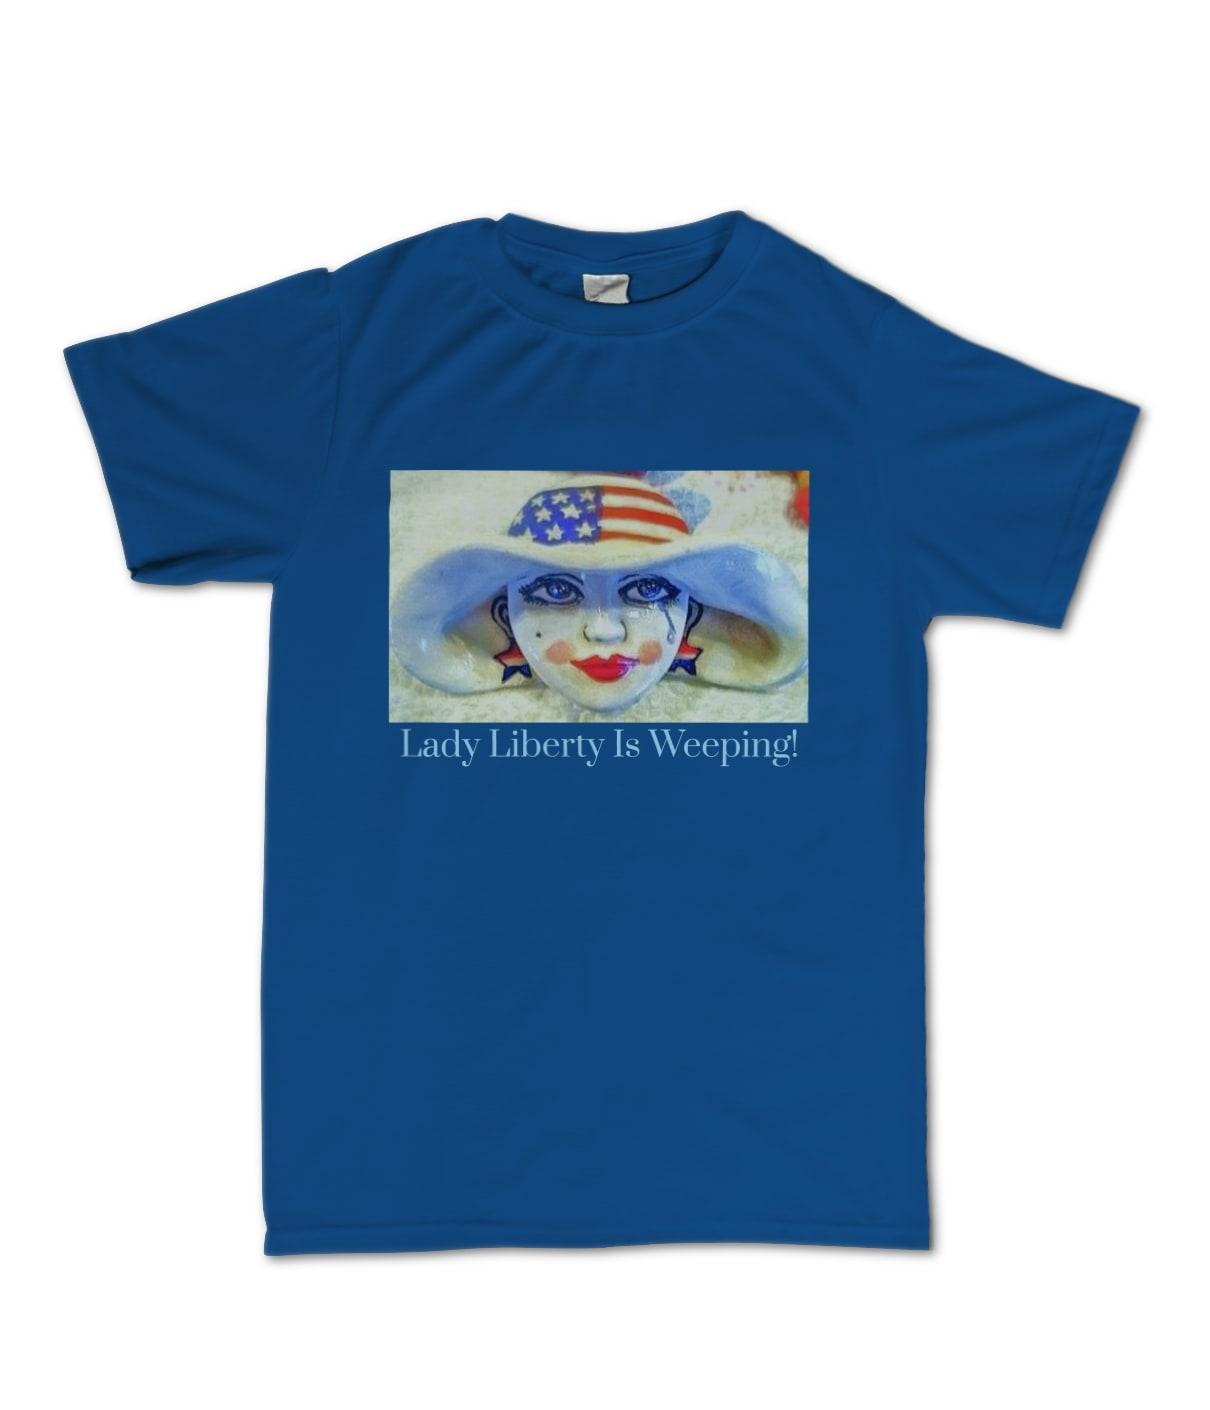 Matthew f  blowers iii  c  2017 lady liberty is weeping   1506003206